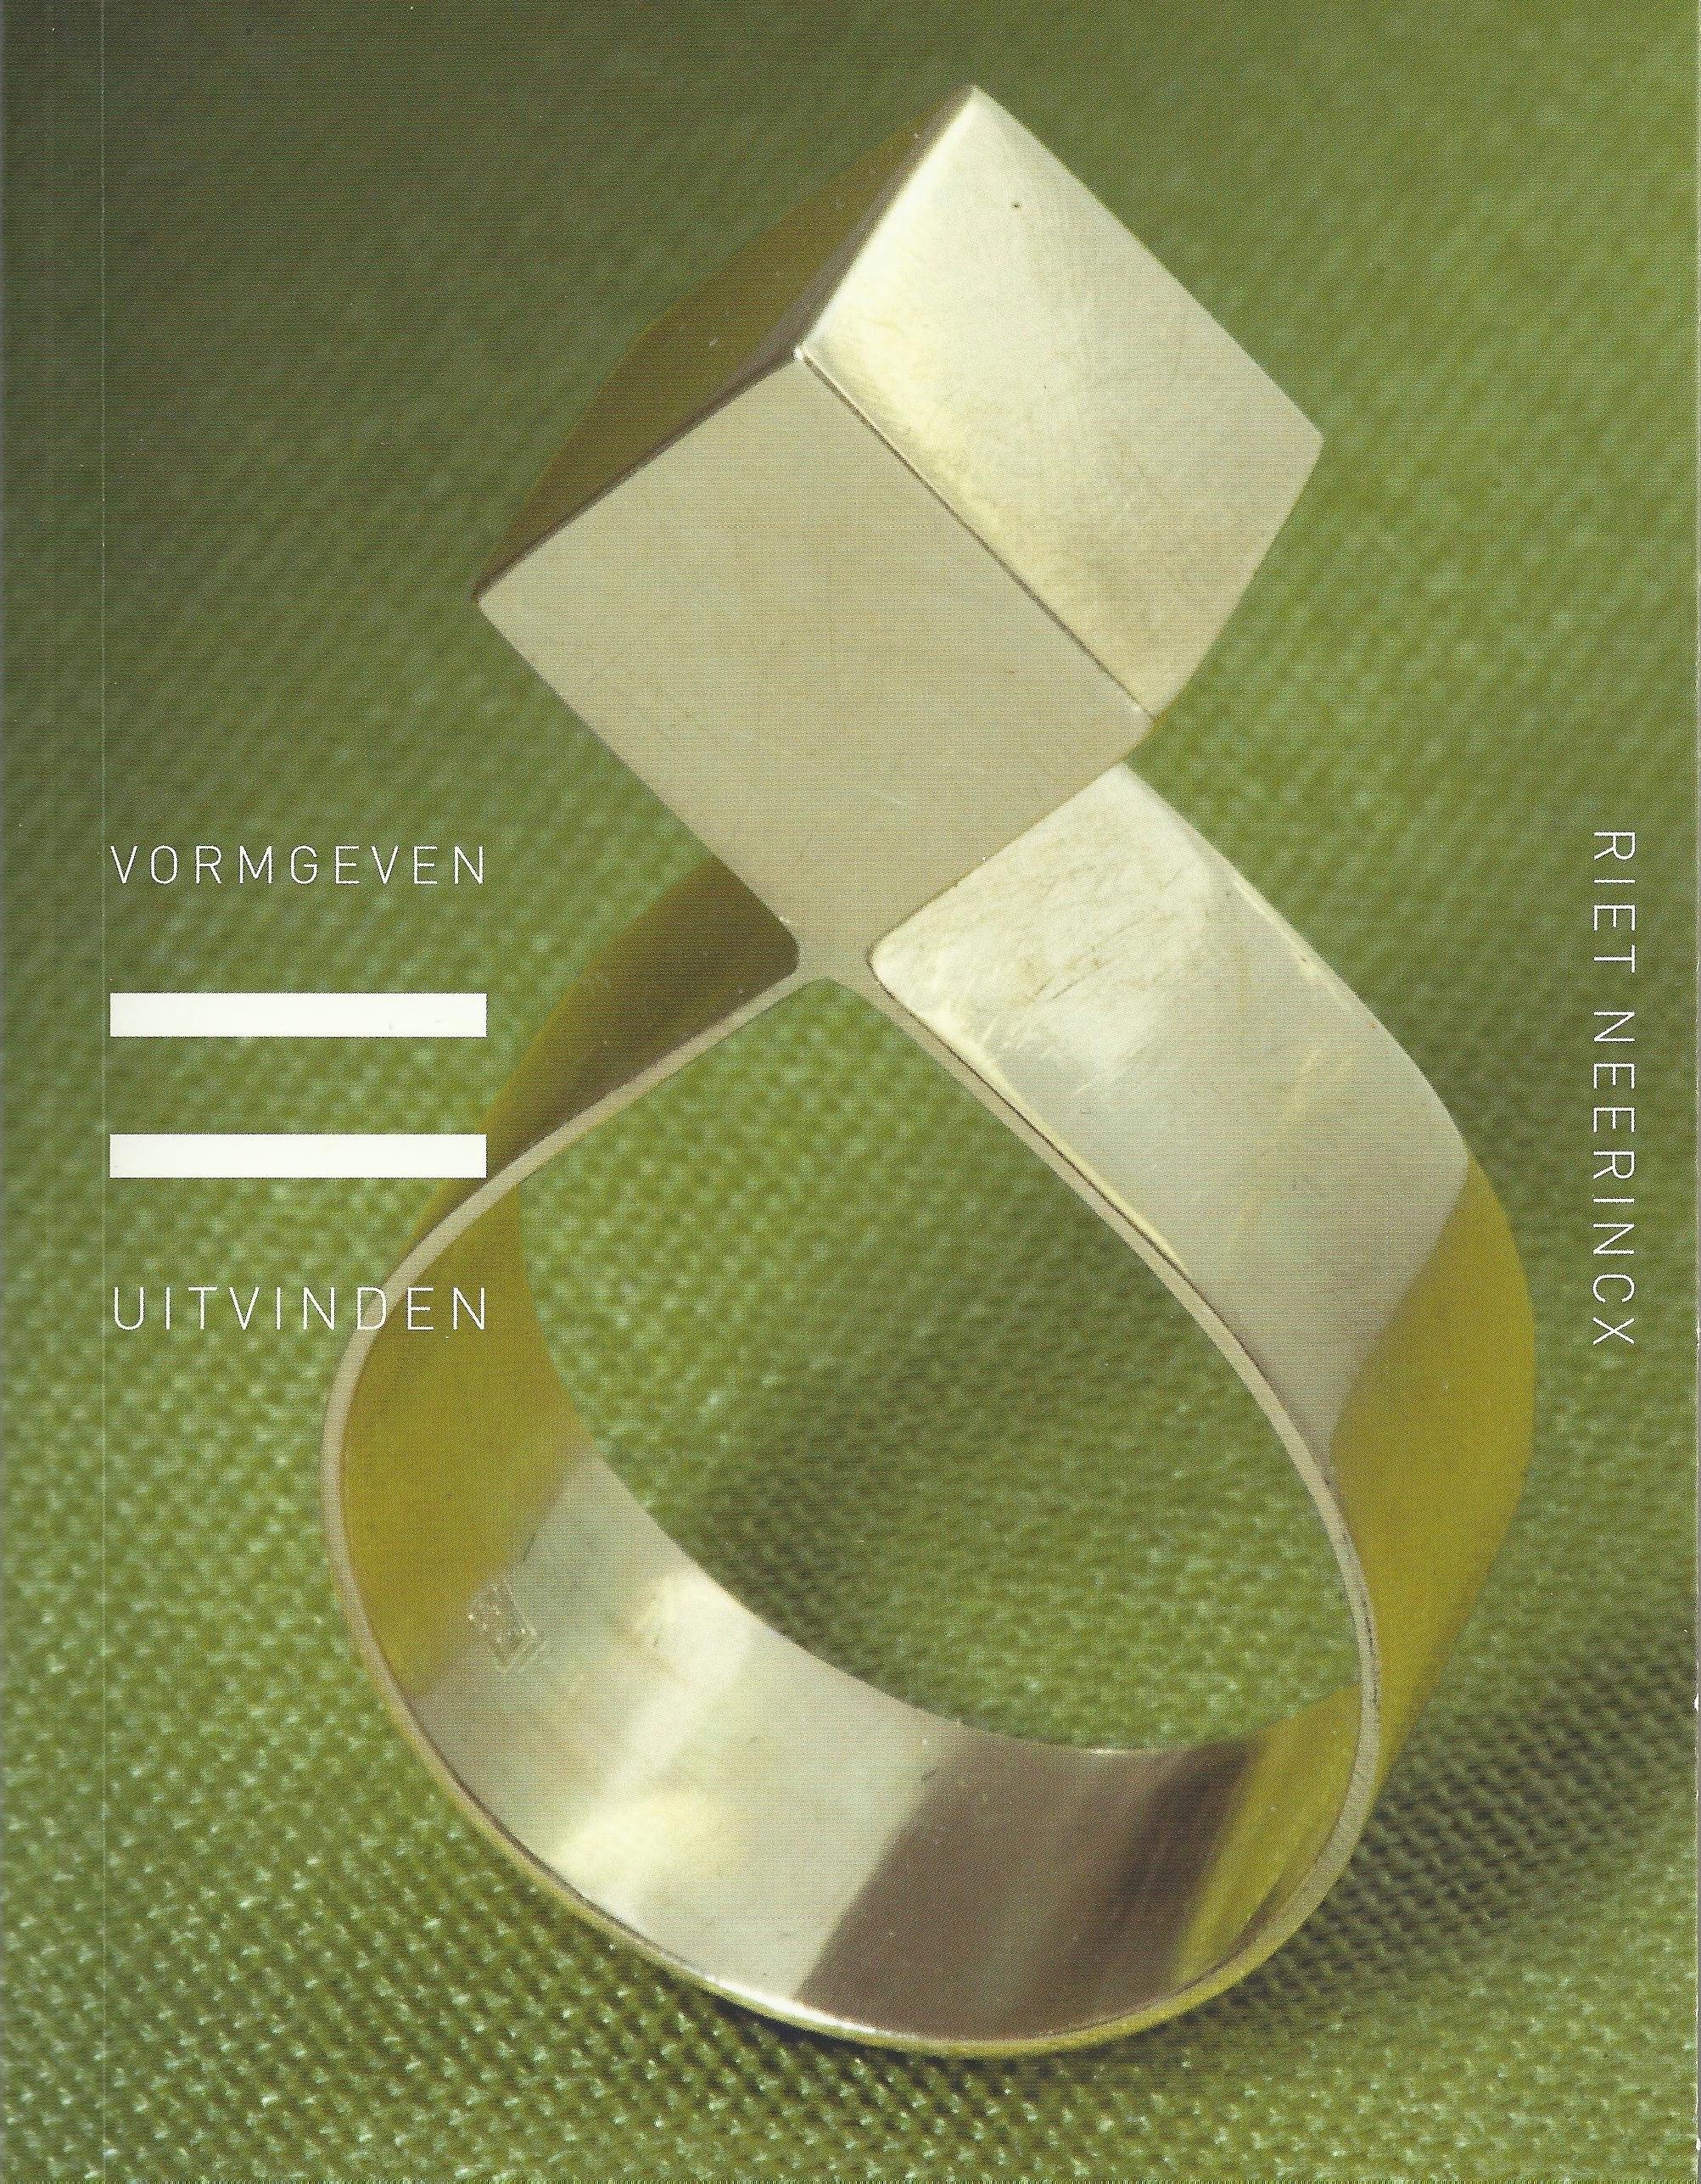 Omslag monografie Riet Neerincx, 2008, ring, 1968, drukwerk, papier, ring